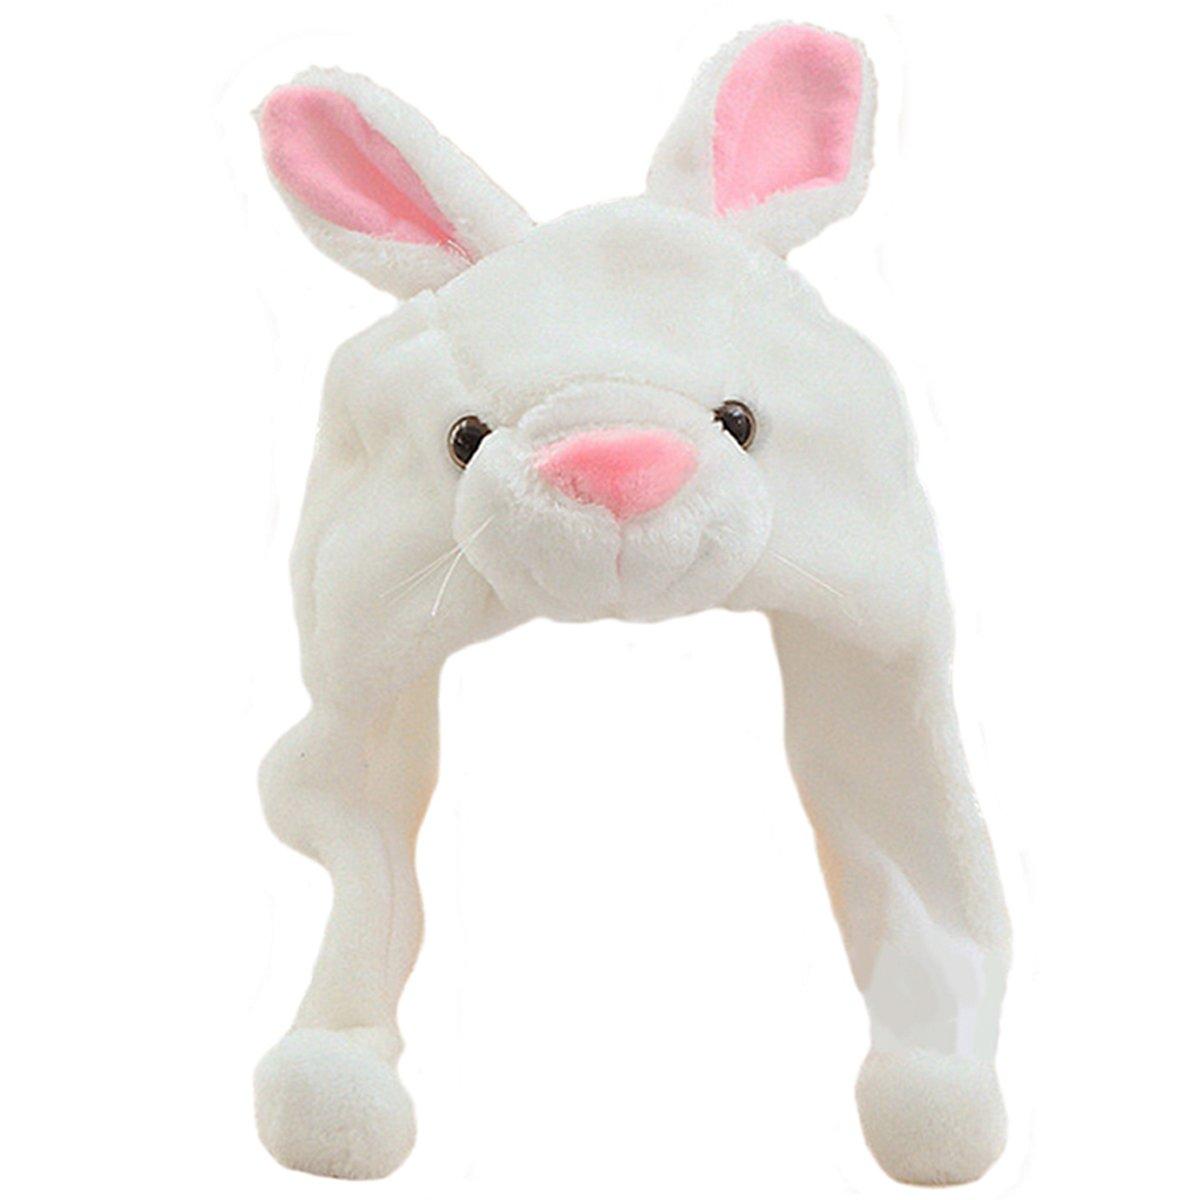 Lacheln Cartoon Stuffed Animal Hat Plush Party Costume Headwear,White Bunny